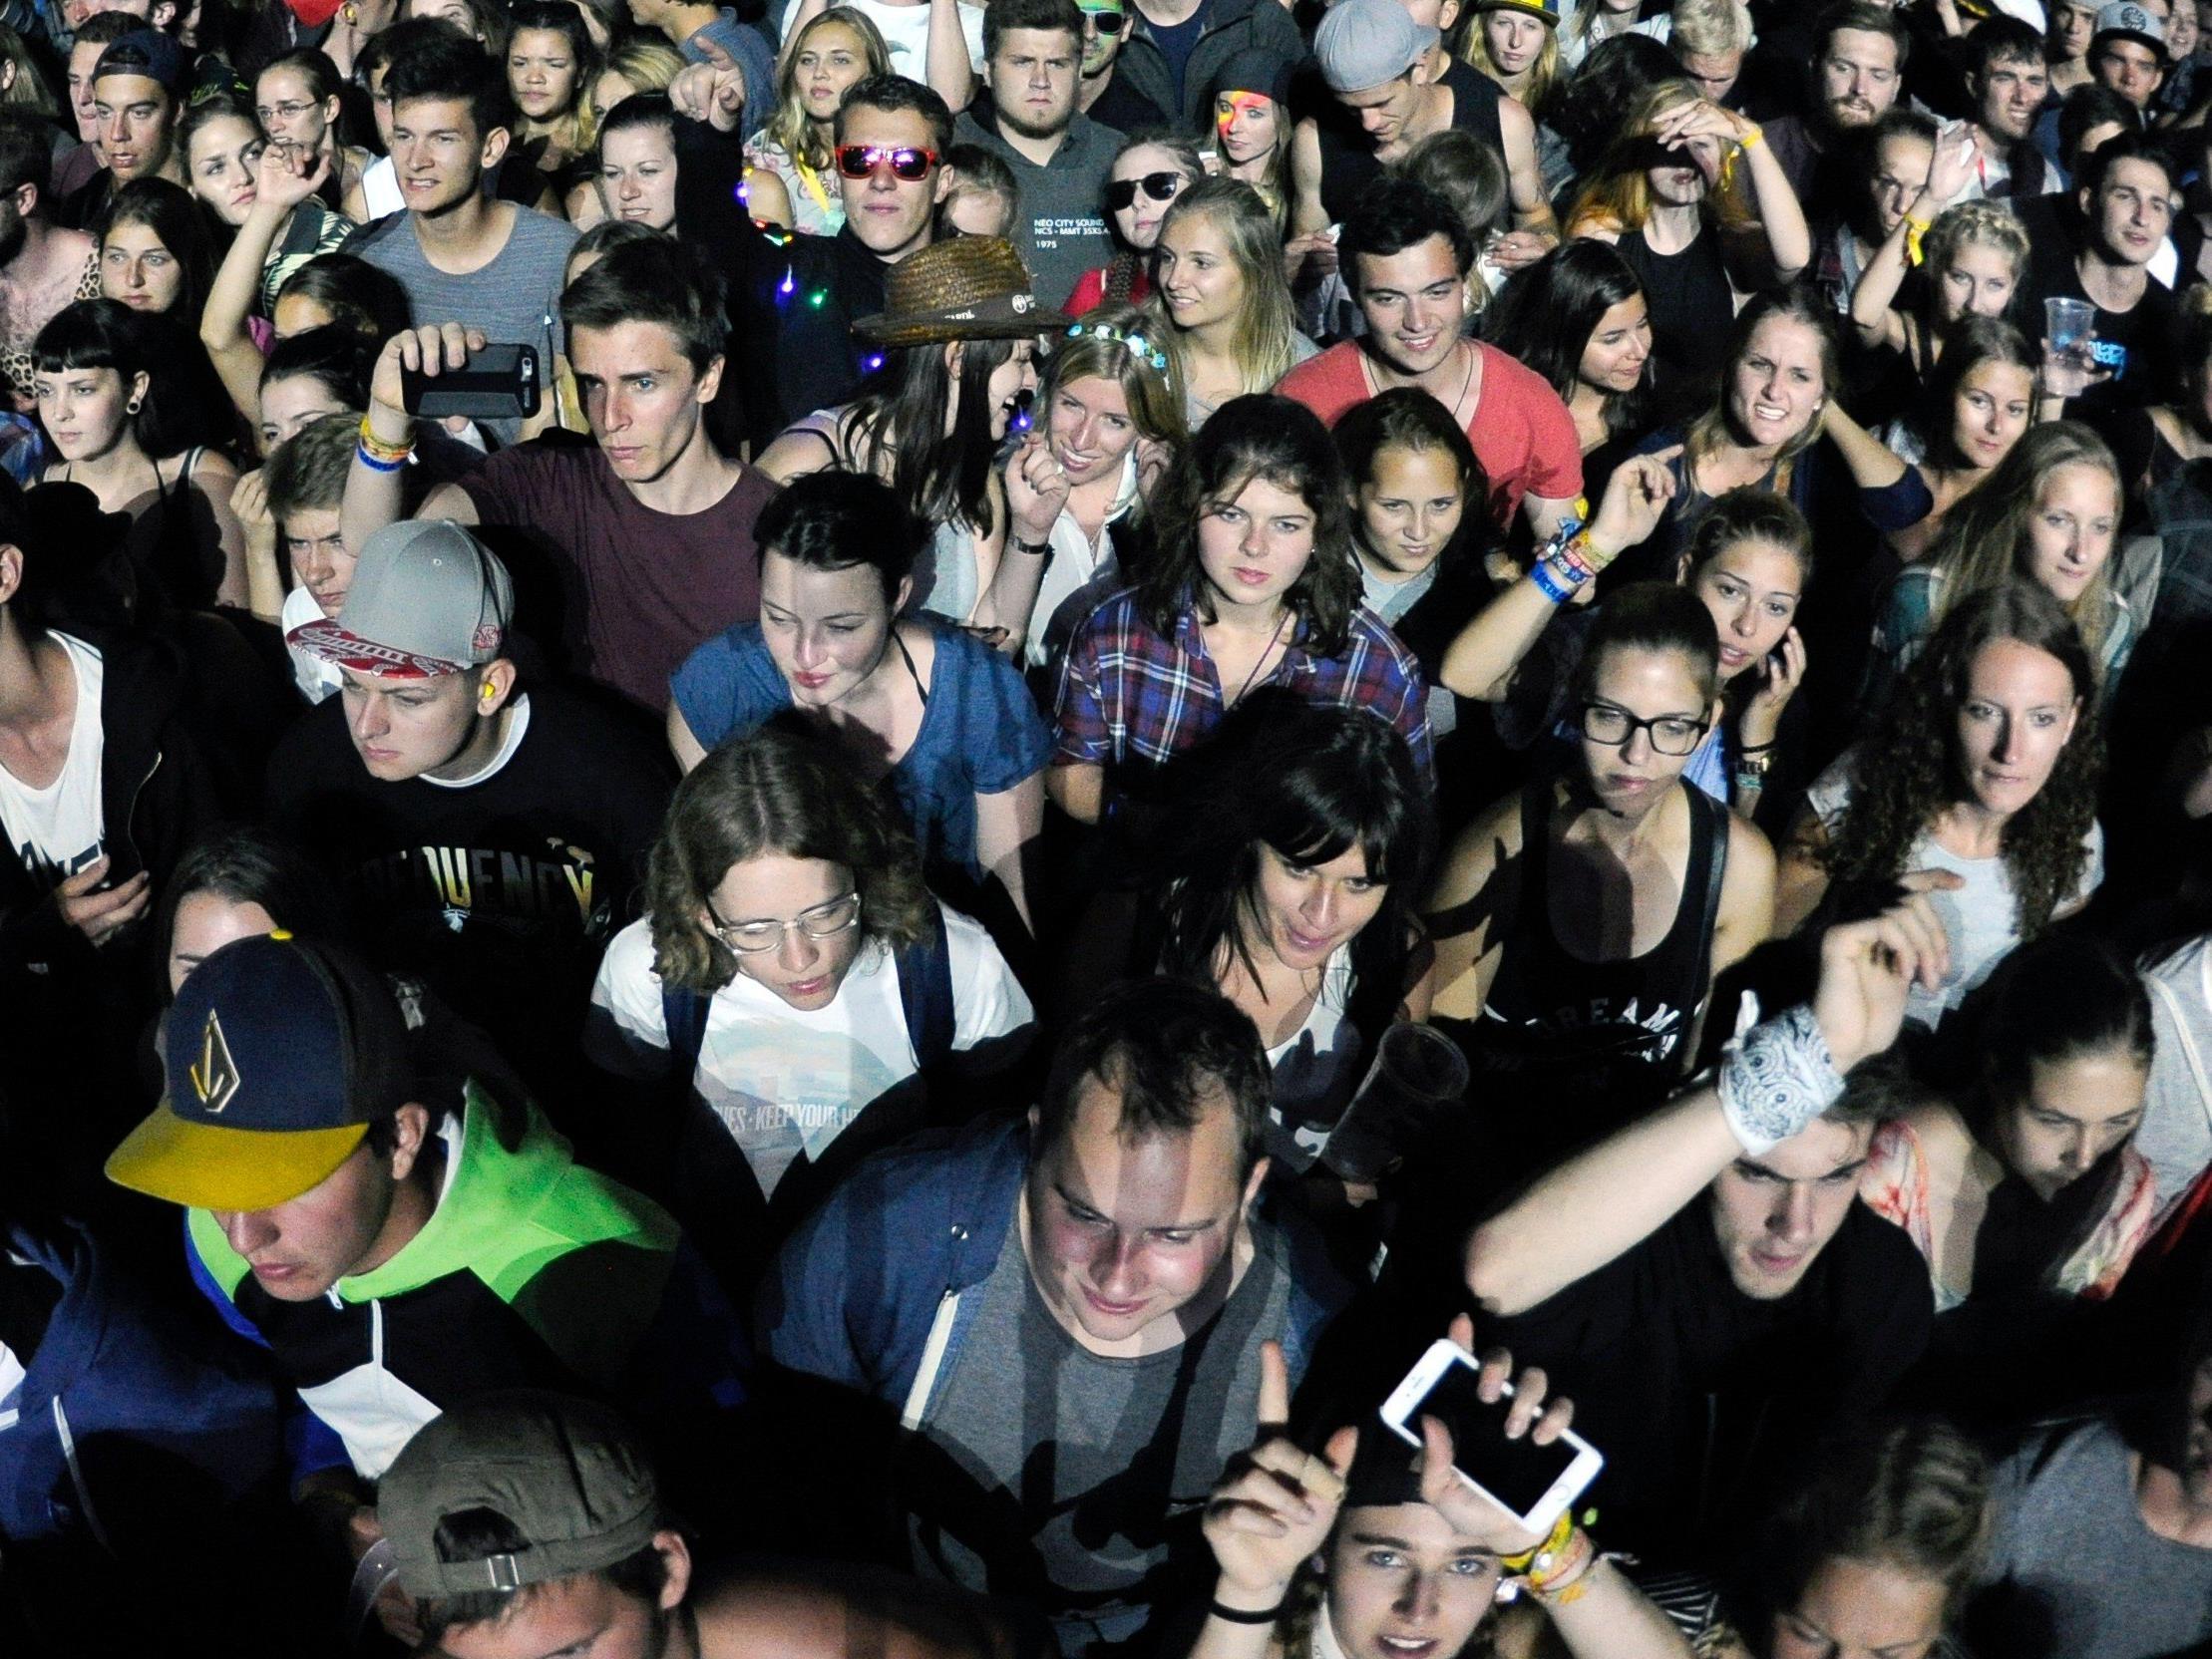 Das Nuke Festival 2016 wurde kurzfristig abgesagt.